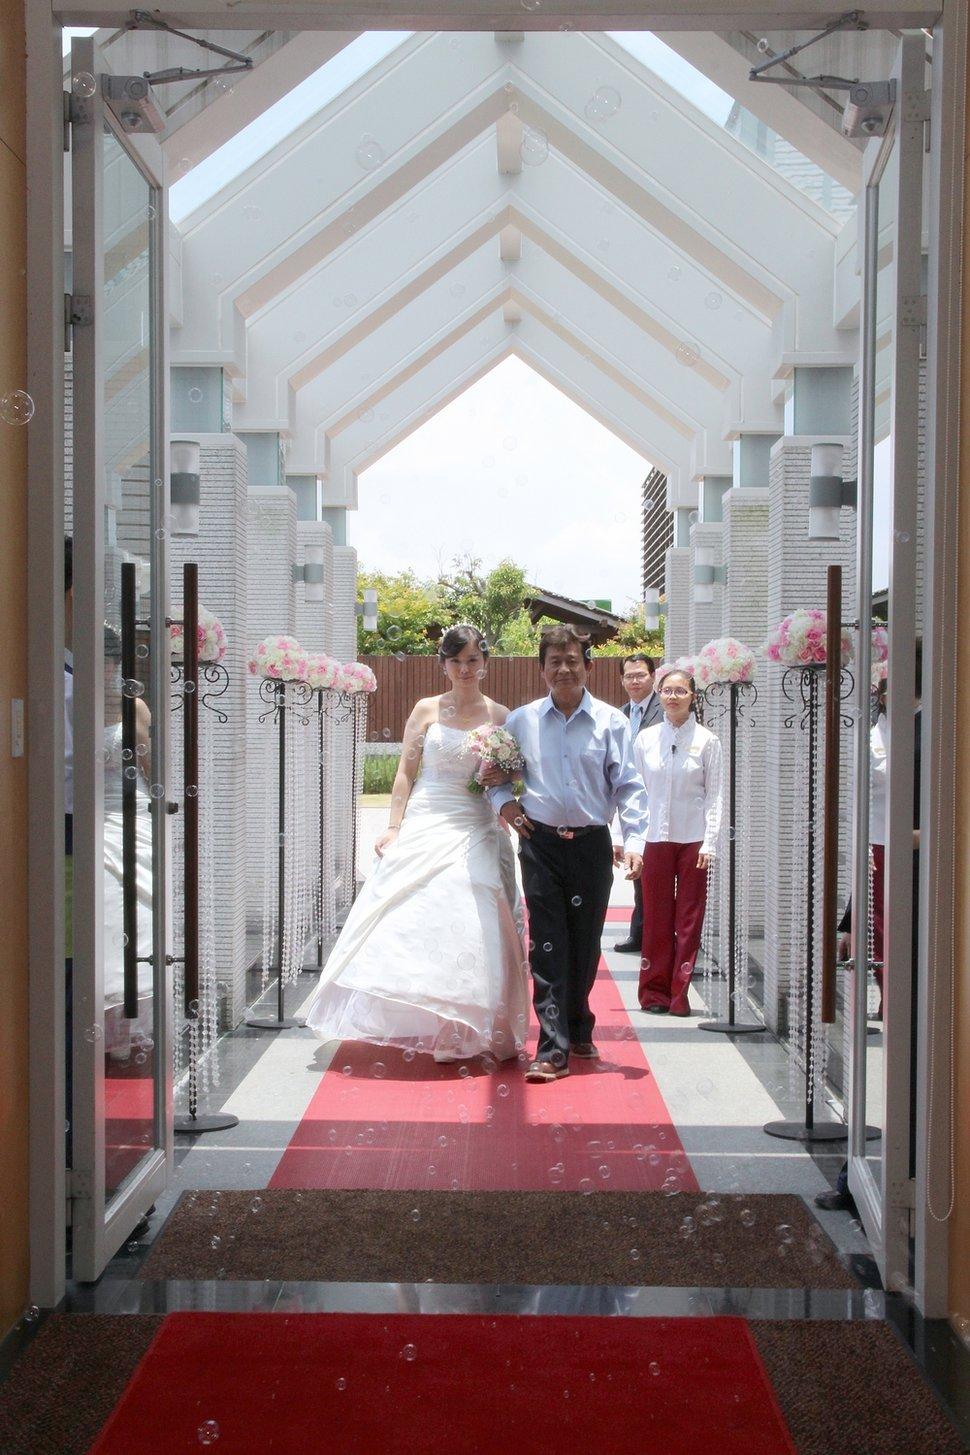 IMG_0081 - 瑞比特婚禮紀錄攝影 - 結婚吧